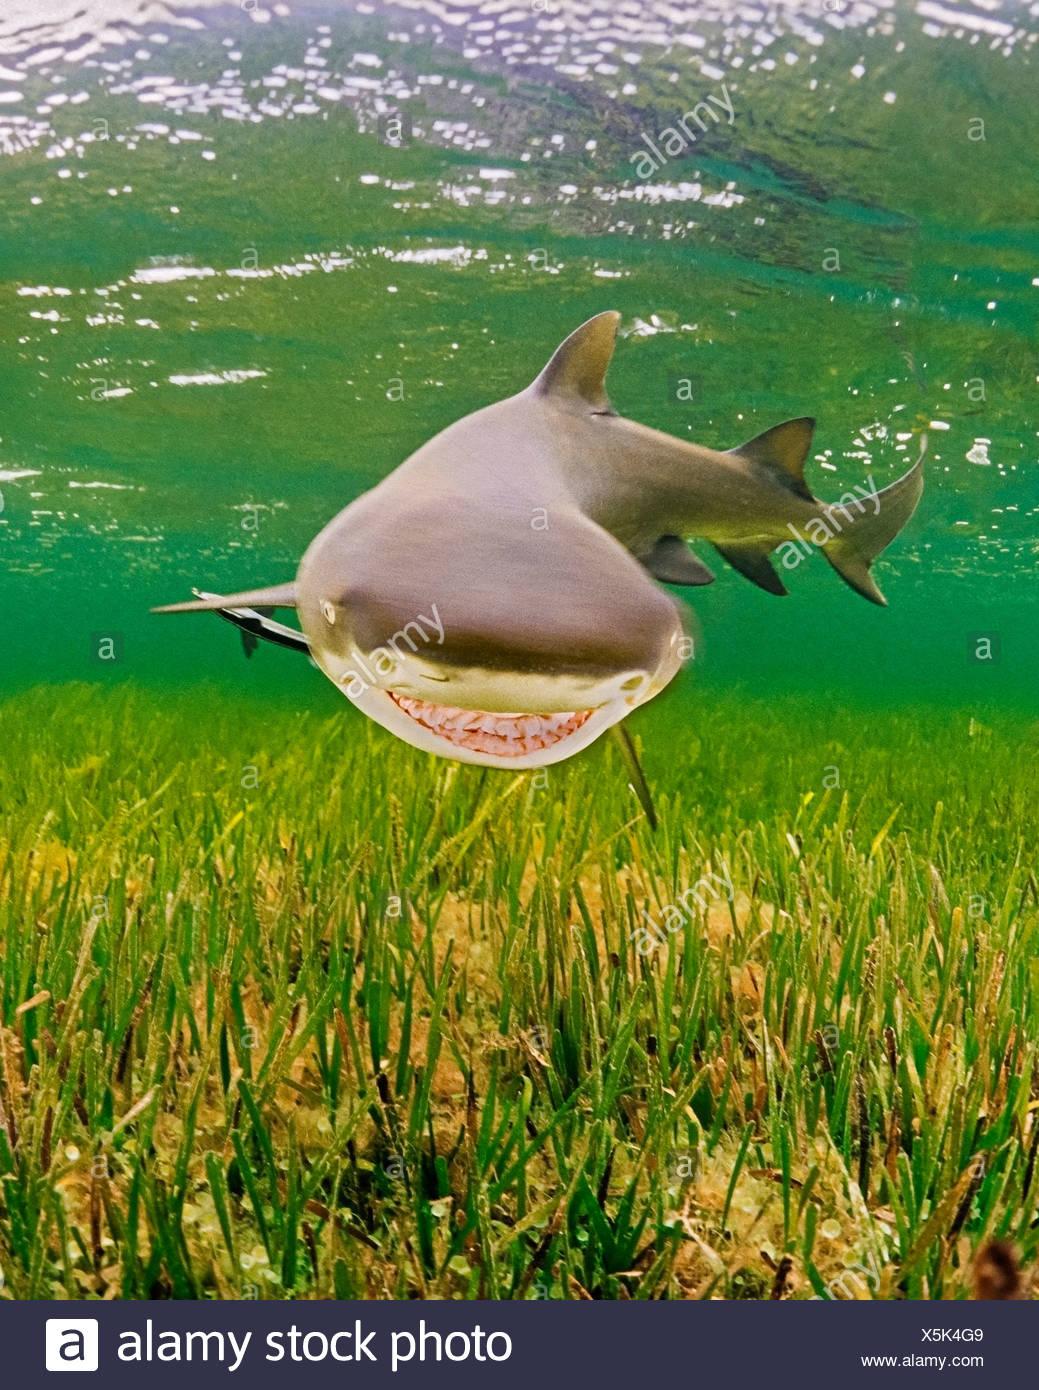 Lemon Shark, Negaprion brevirostris, Key Largo, Florida, USA - Stock Image